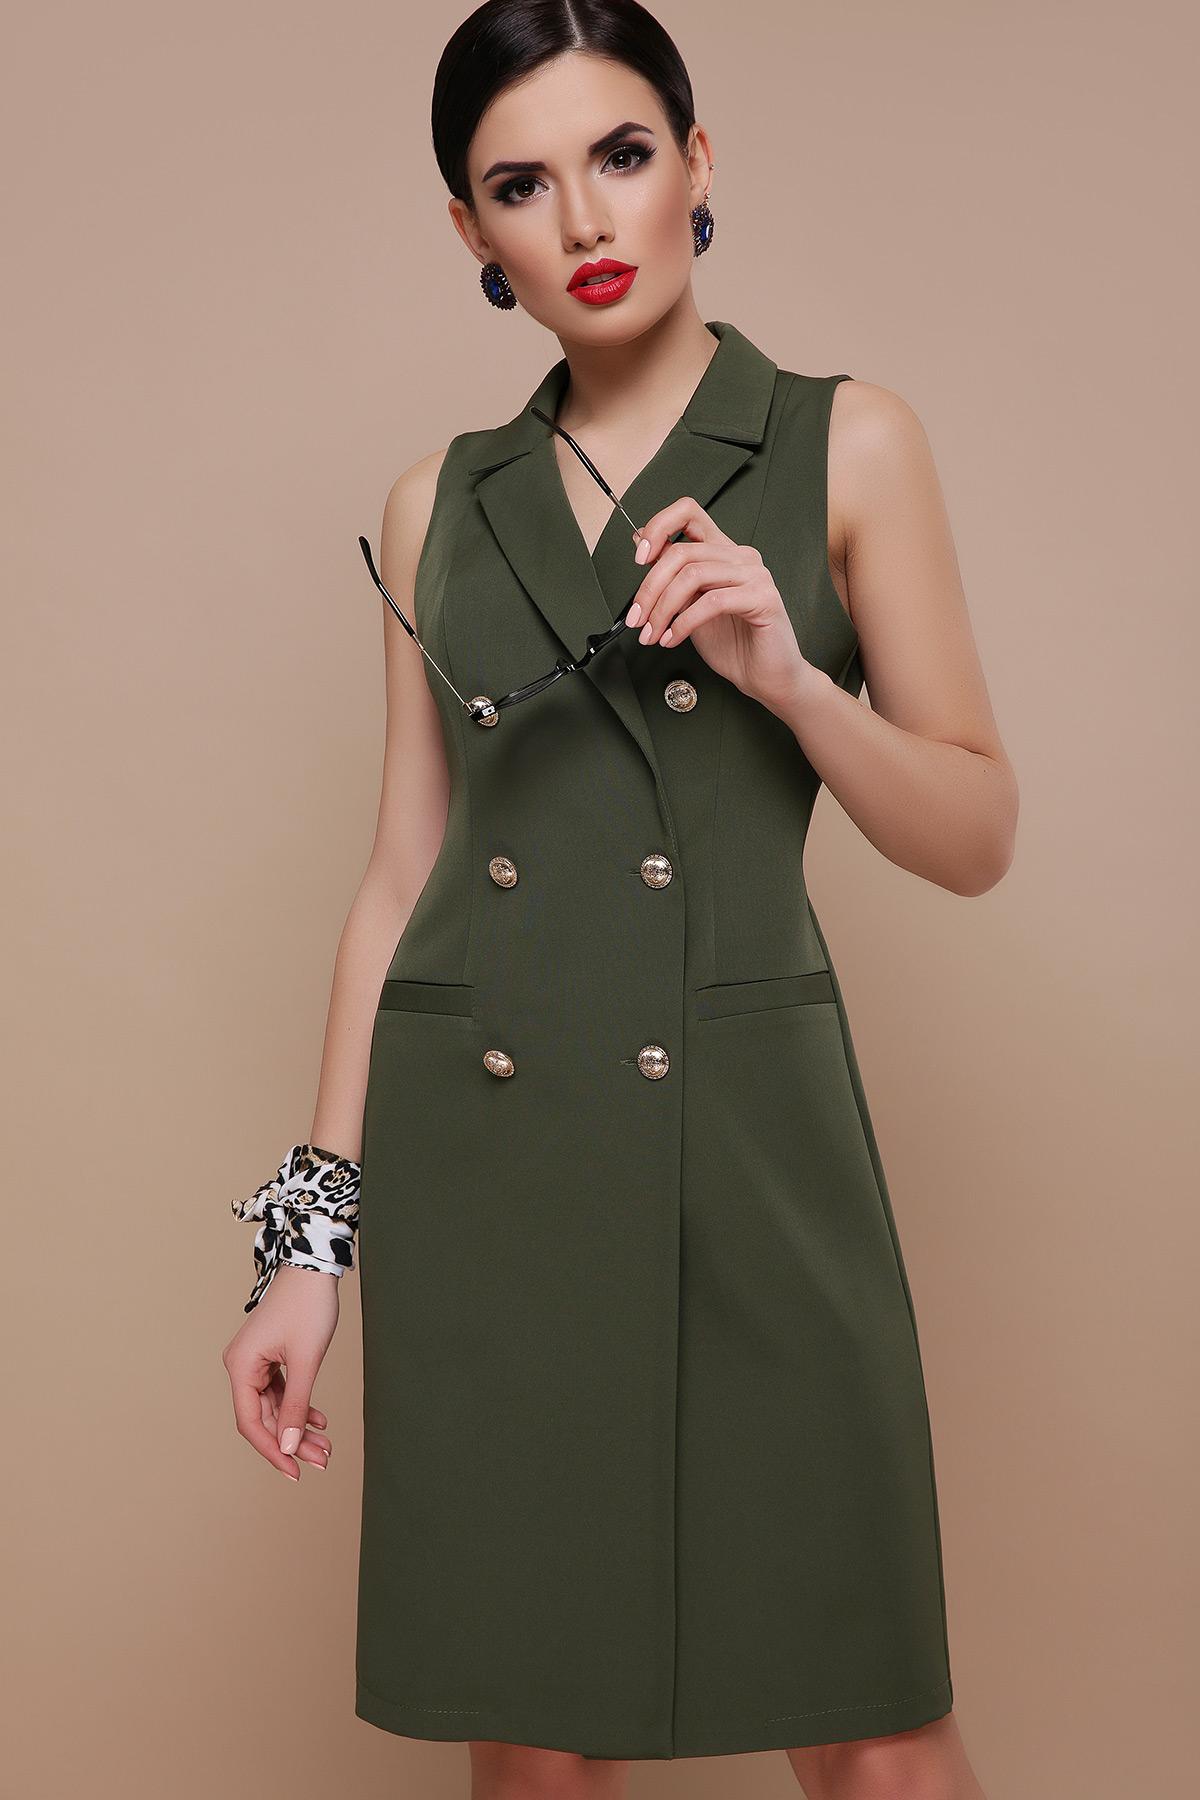 070bfe352e2 Закупка Fashion Glem - 3 19. Совместные покупки